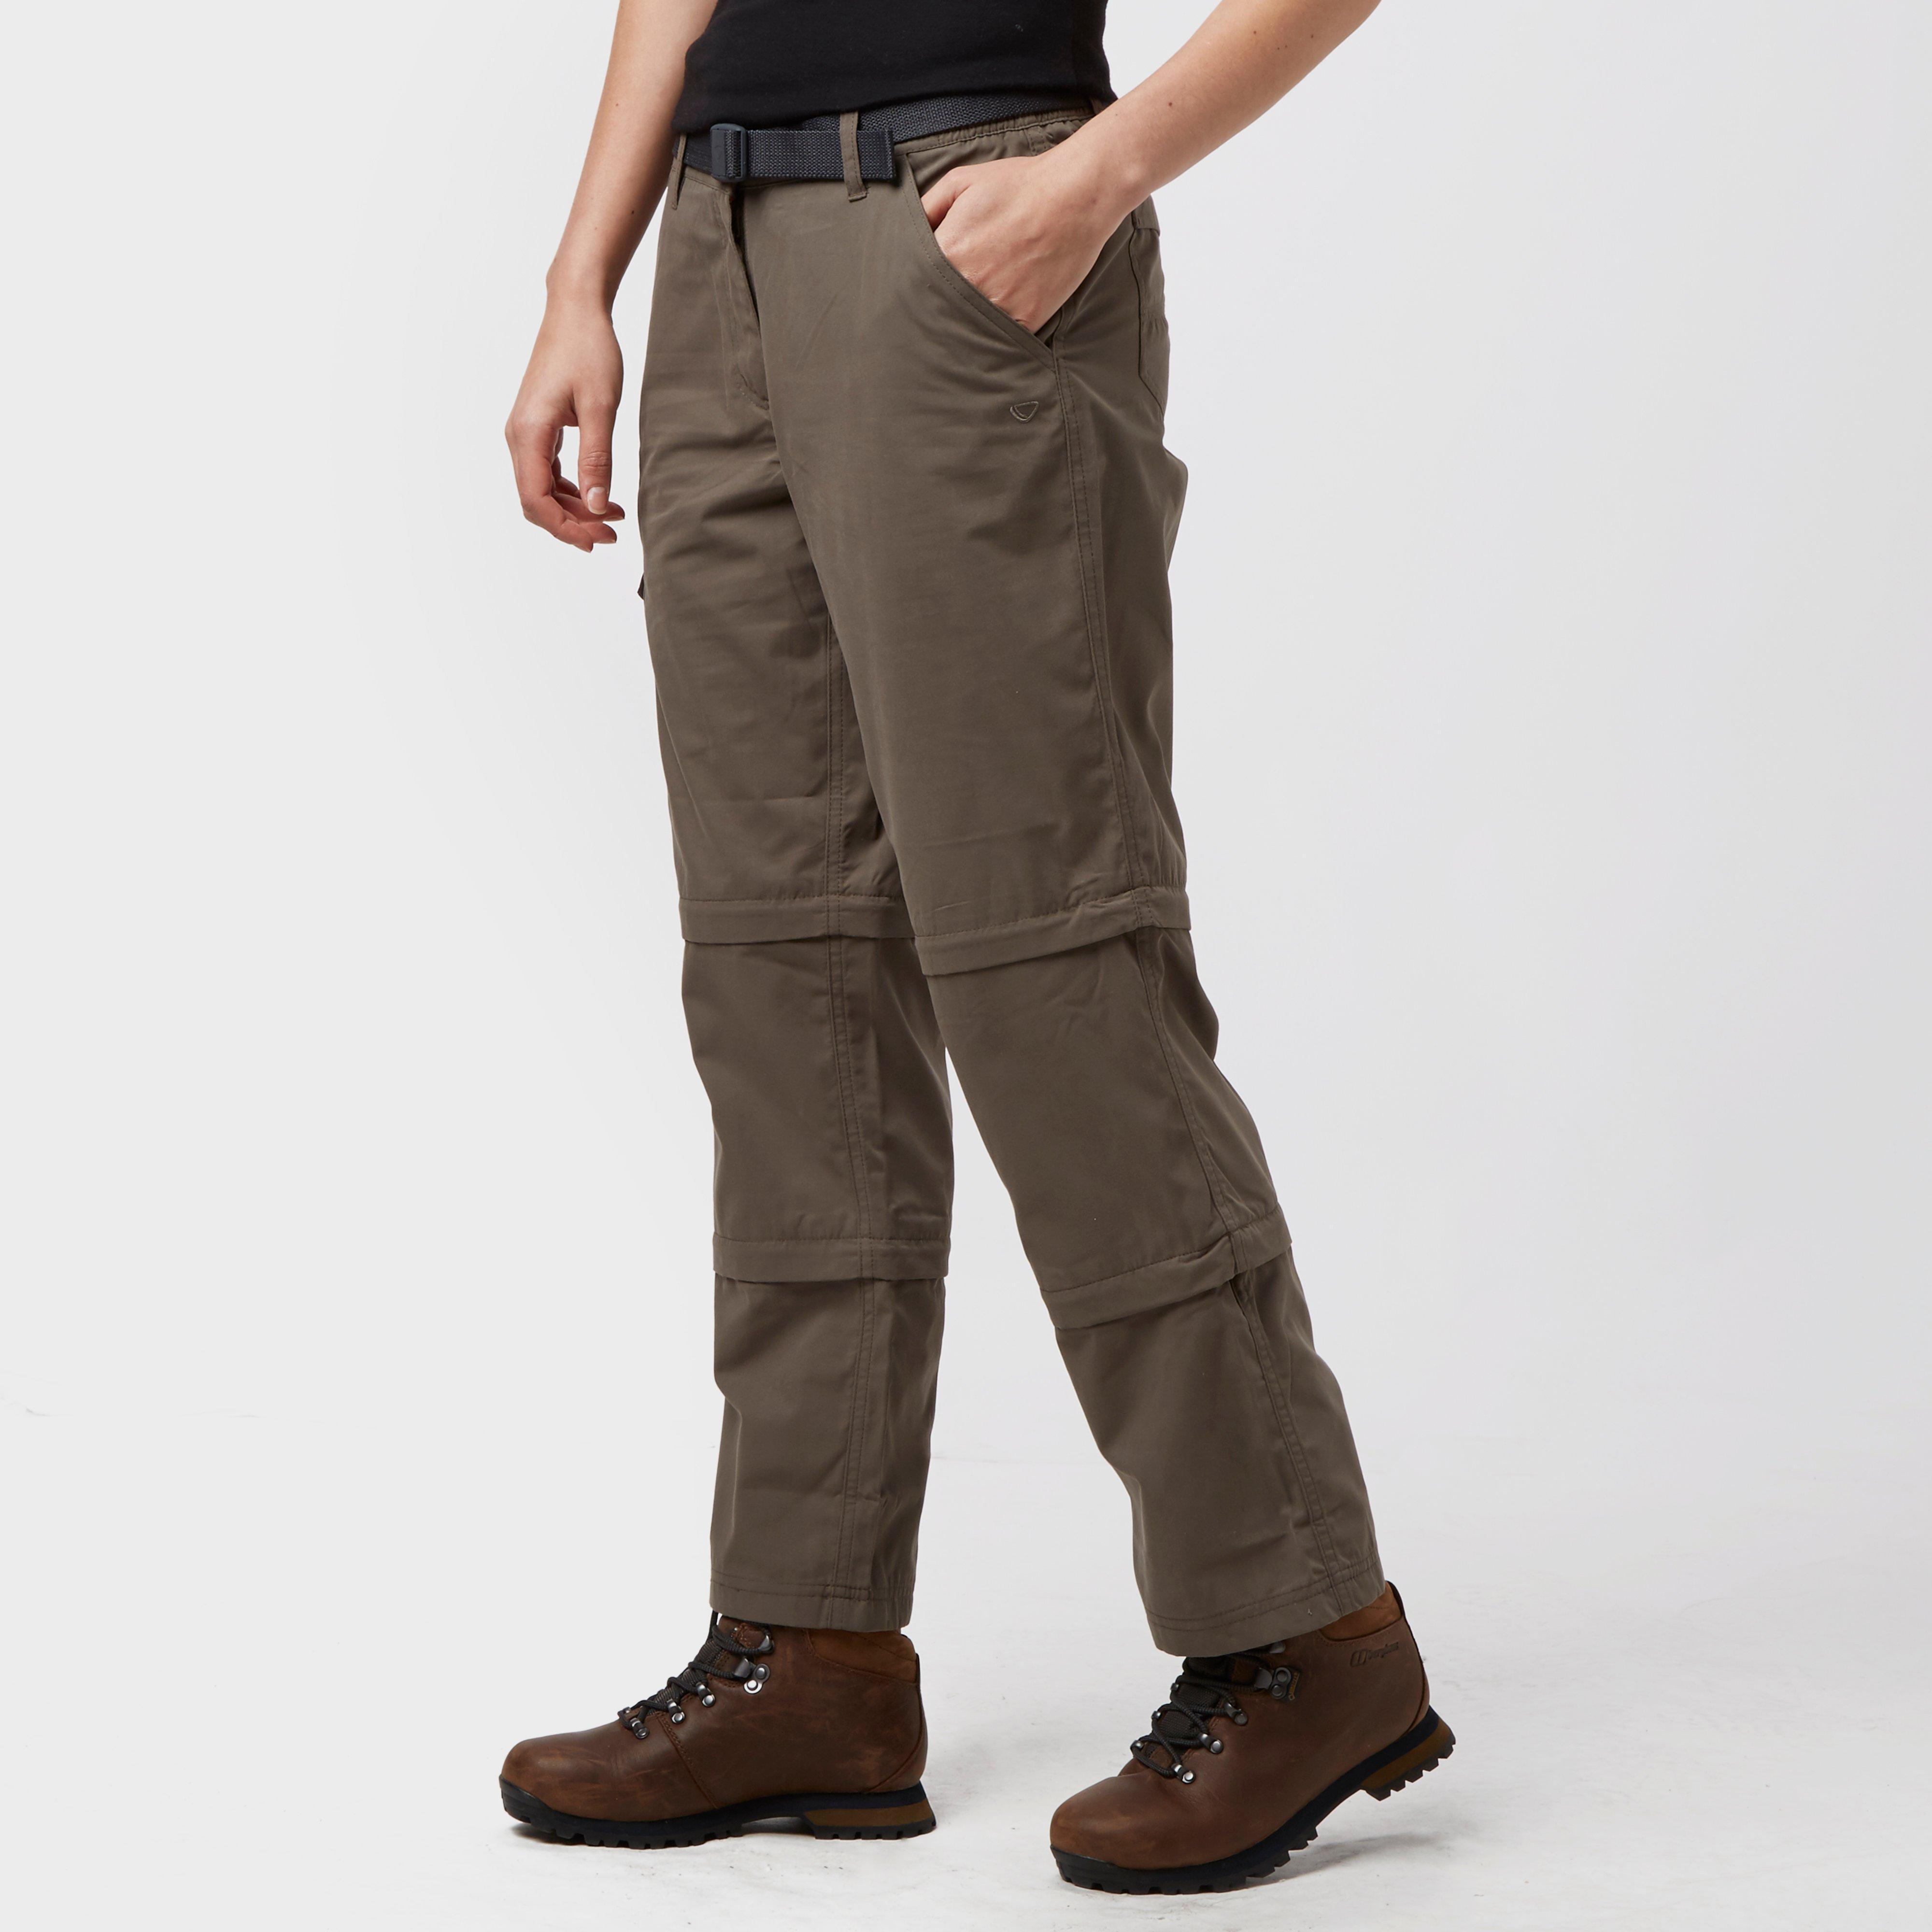 Brasher Womens Double Zip-off Trousers - Brown/brown  Brown/brown